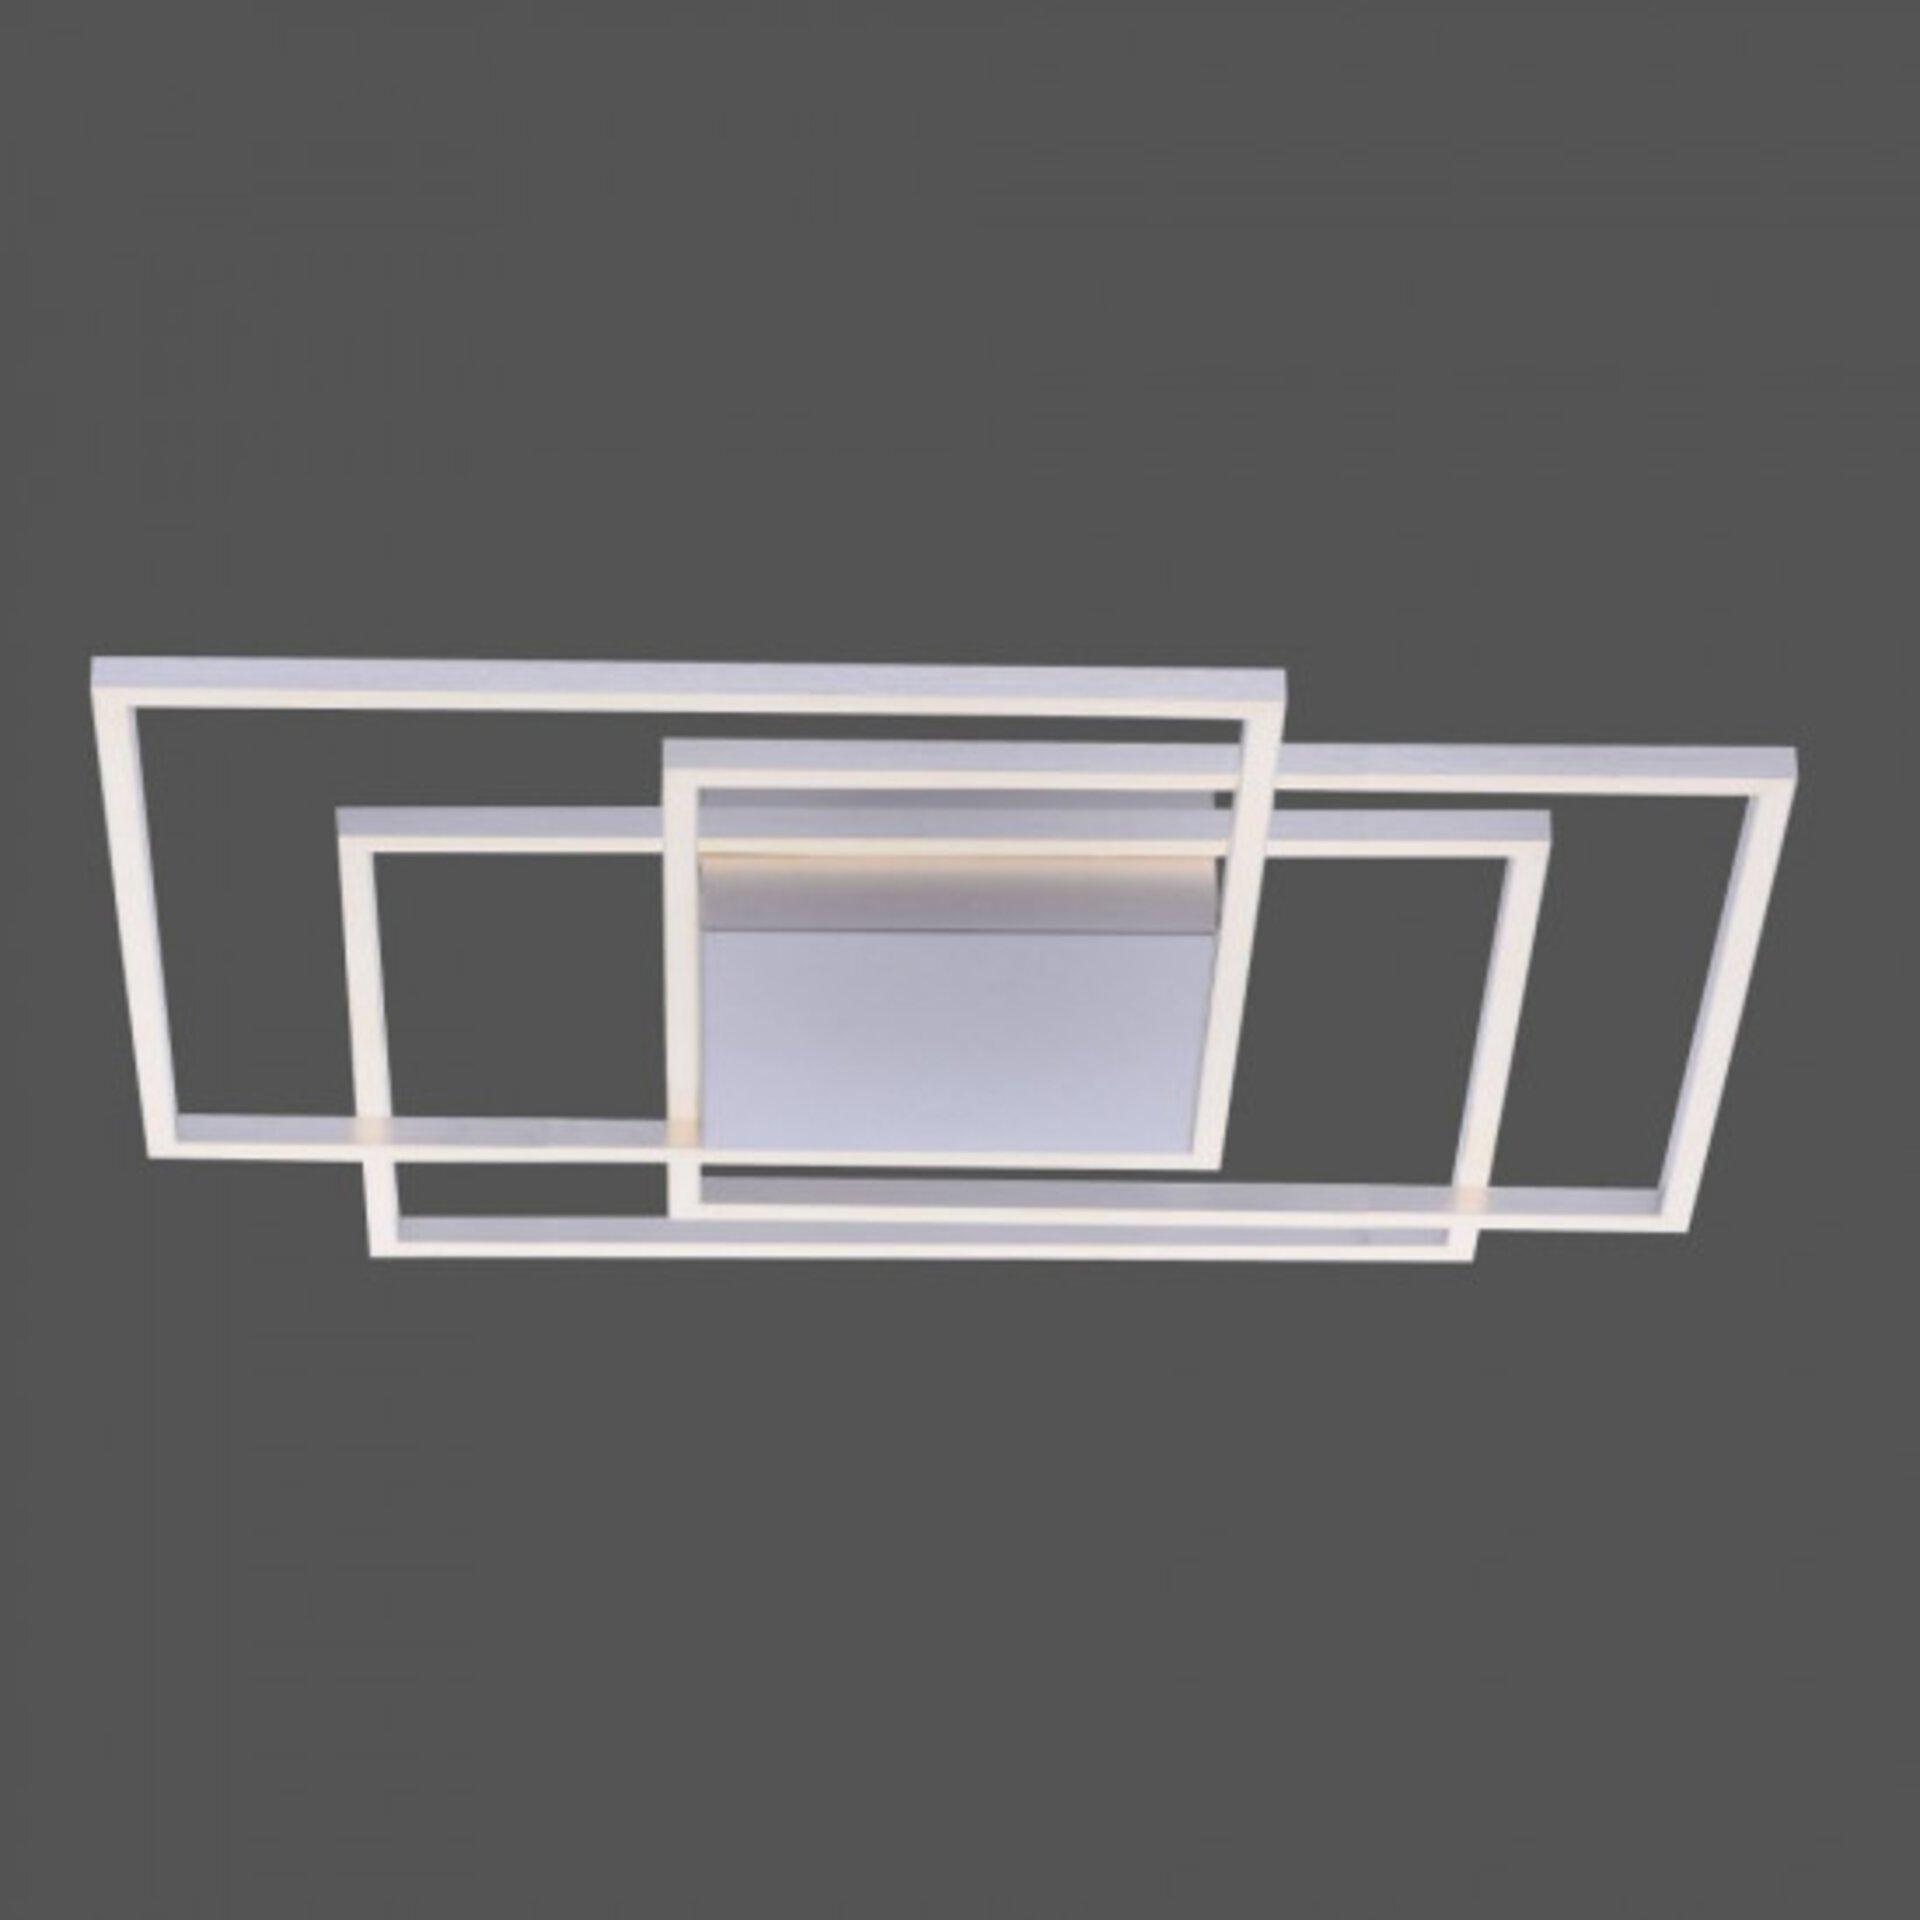 Deckenleuchte INIGO Paul Neuhaus Metall silber 75 x 7 x 75 cm